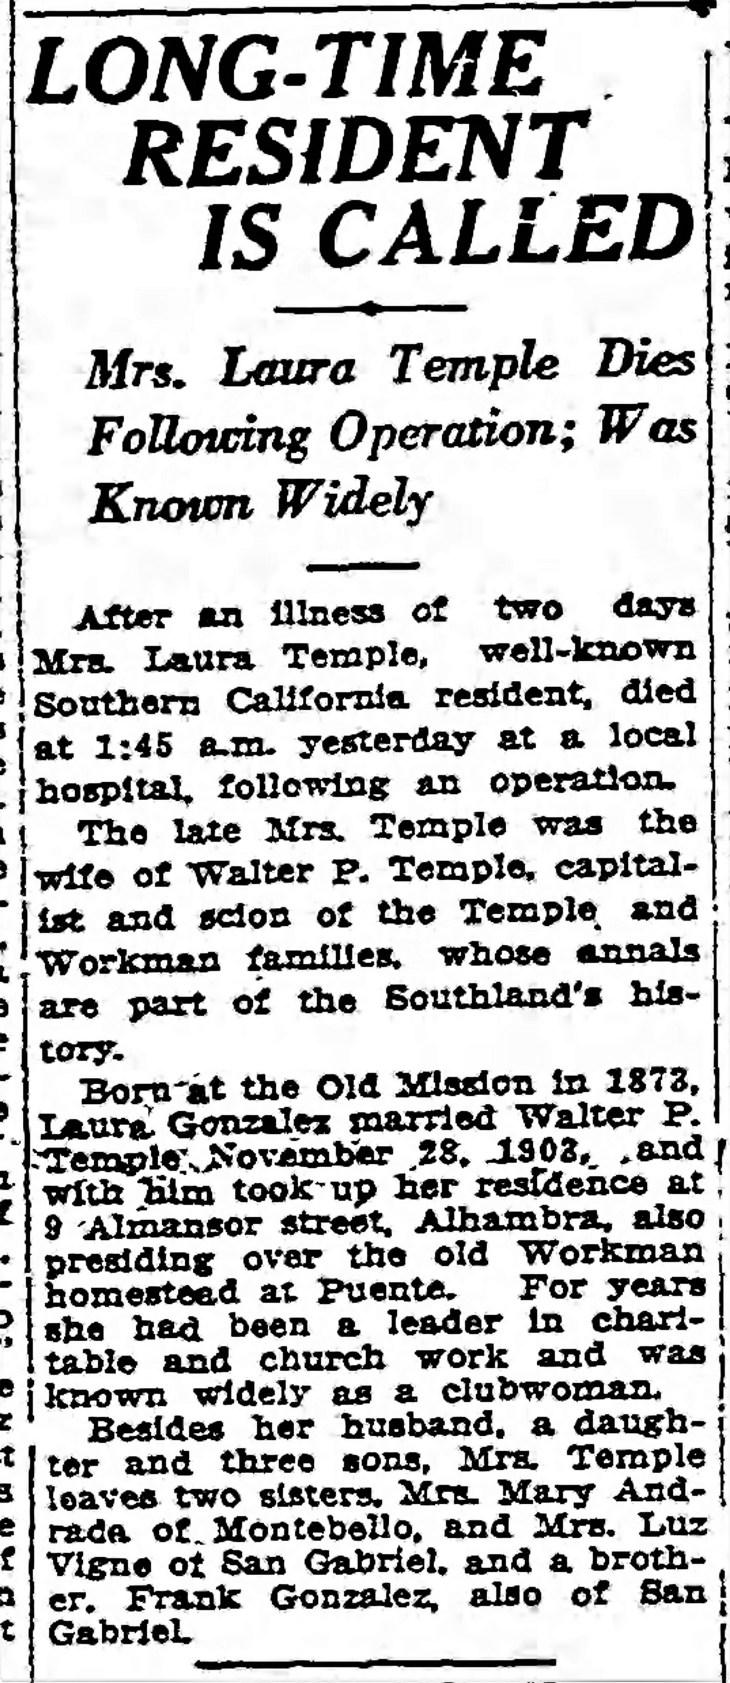 The_Los_Angeles_Times_Fri__Dec_29__1922_